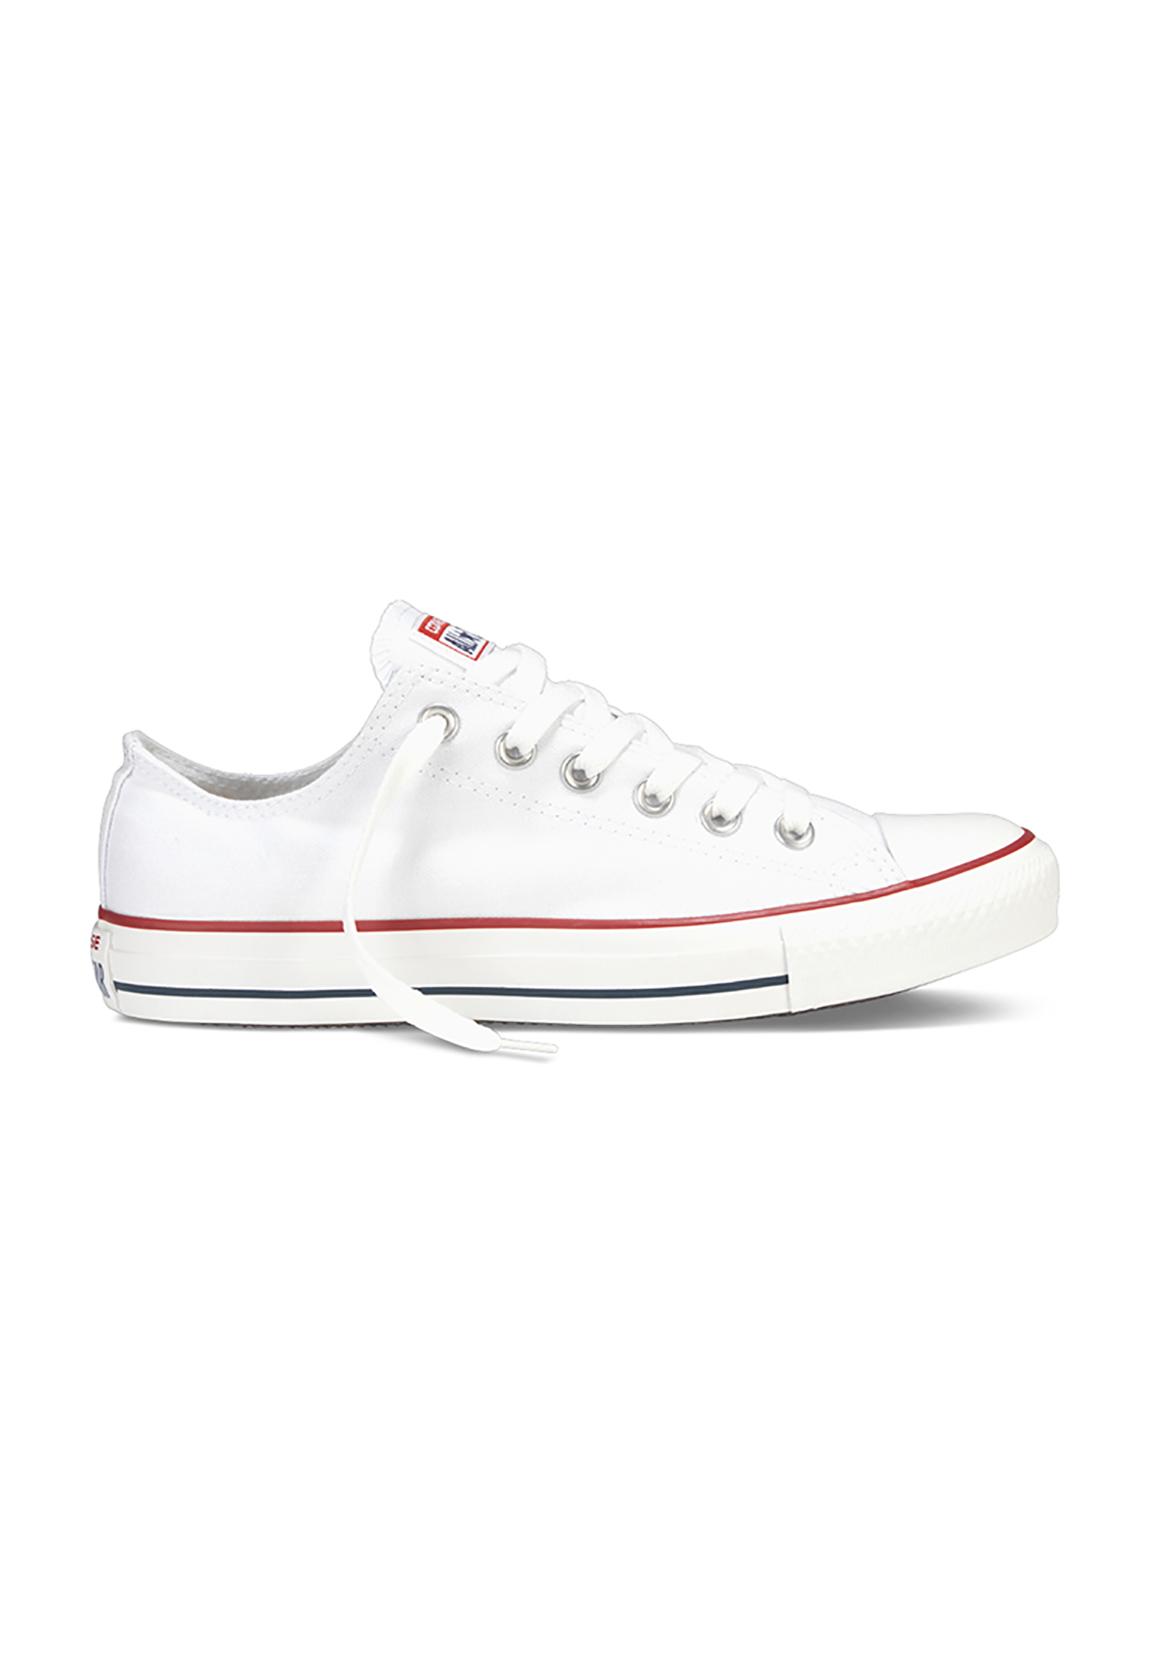 best loved 119b3 3982b Converse Basic Chucks - All Star OX M7652C Weiss